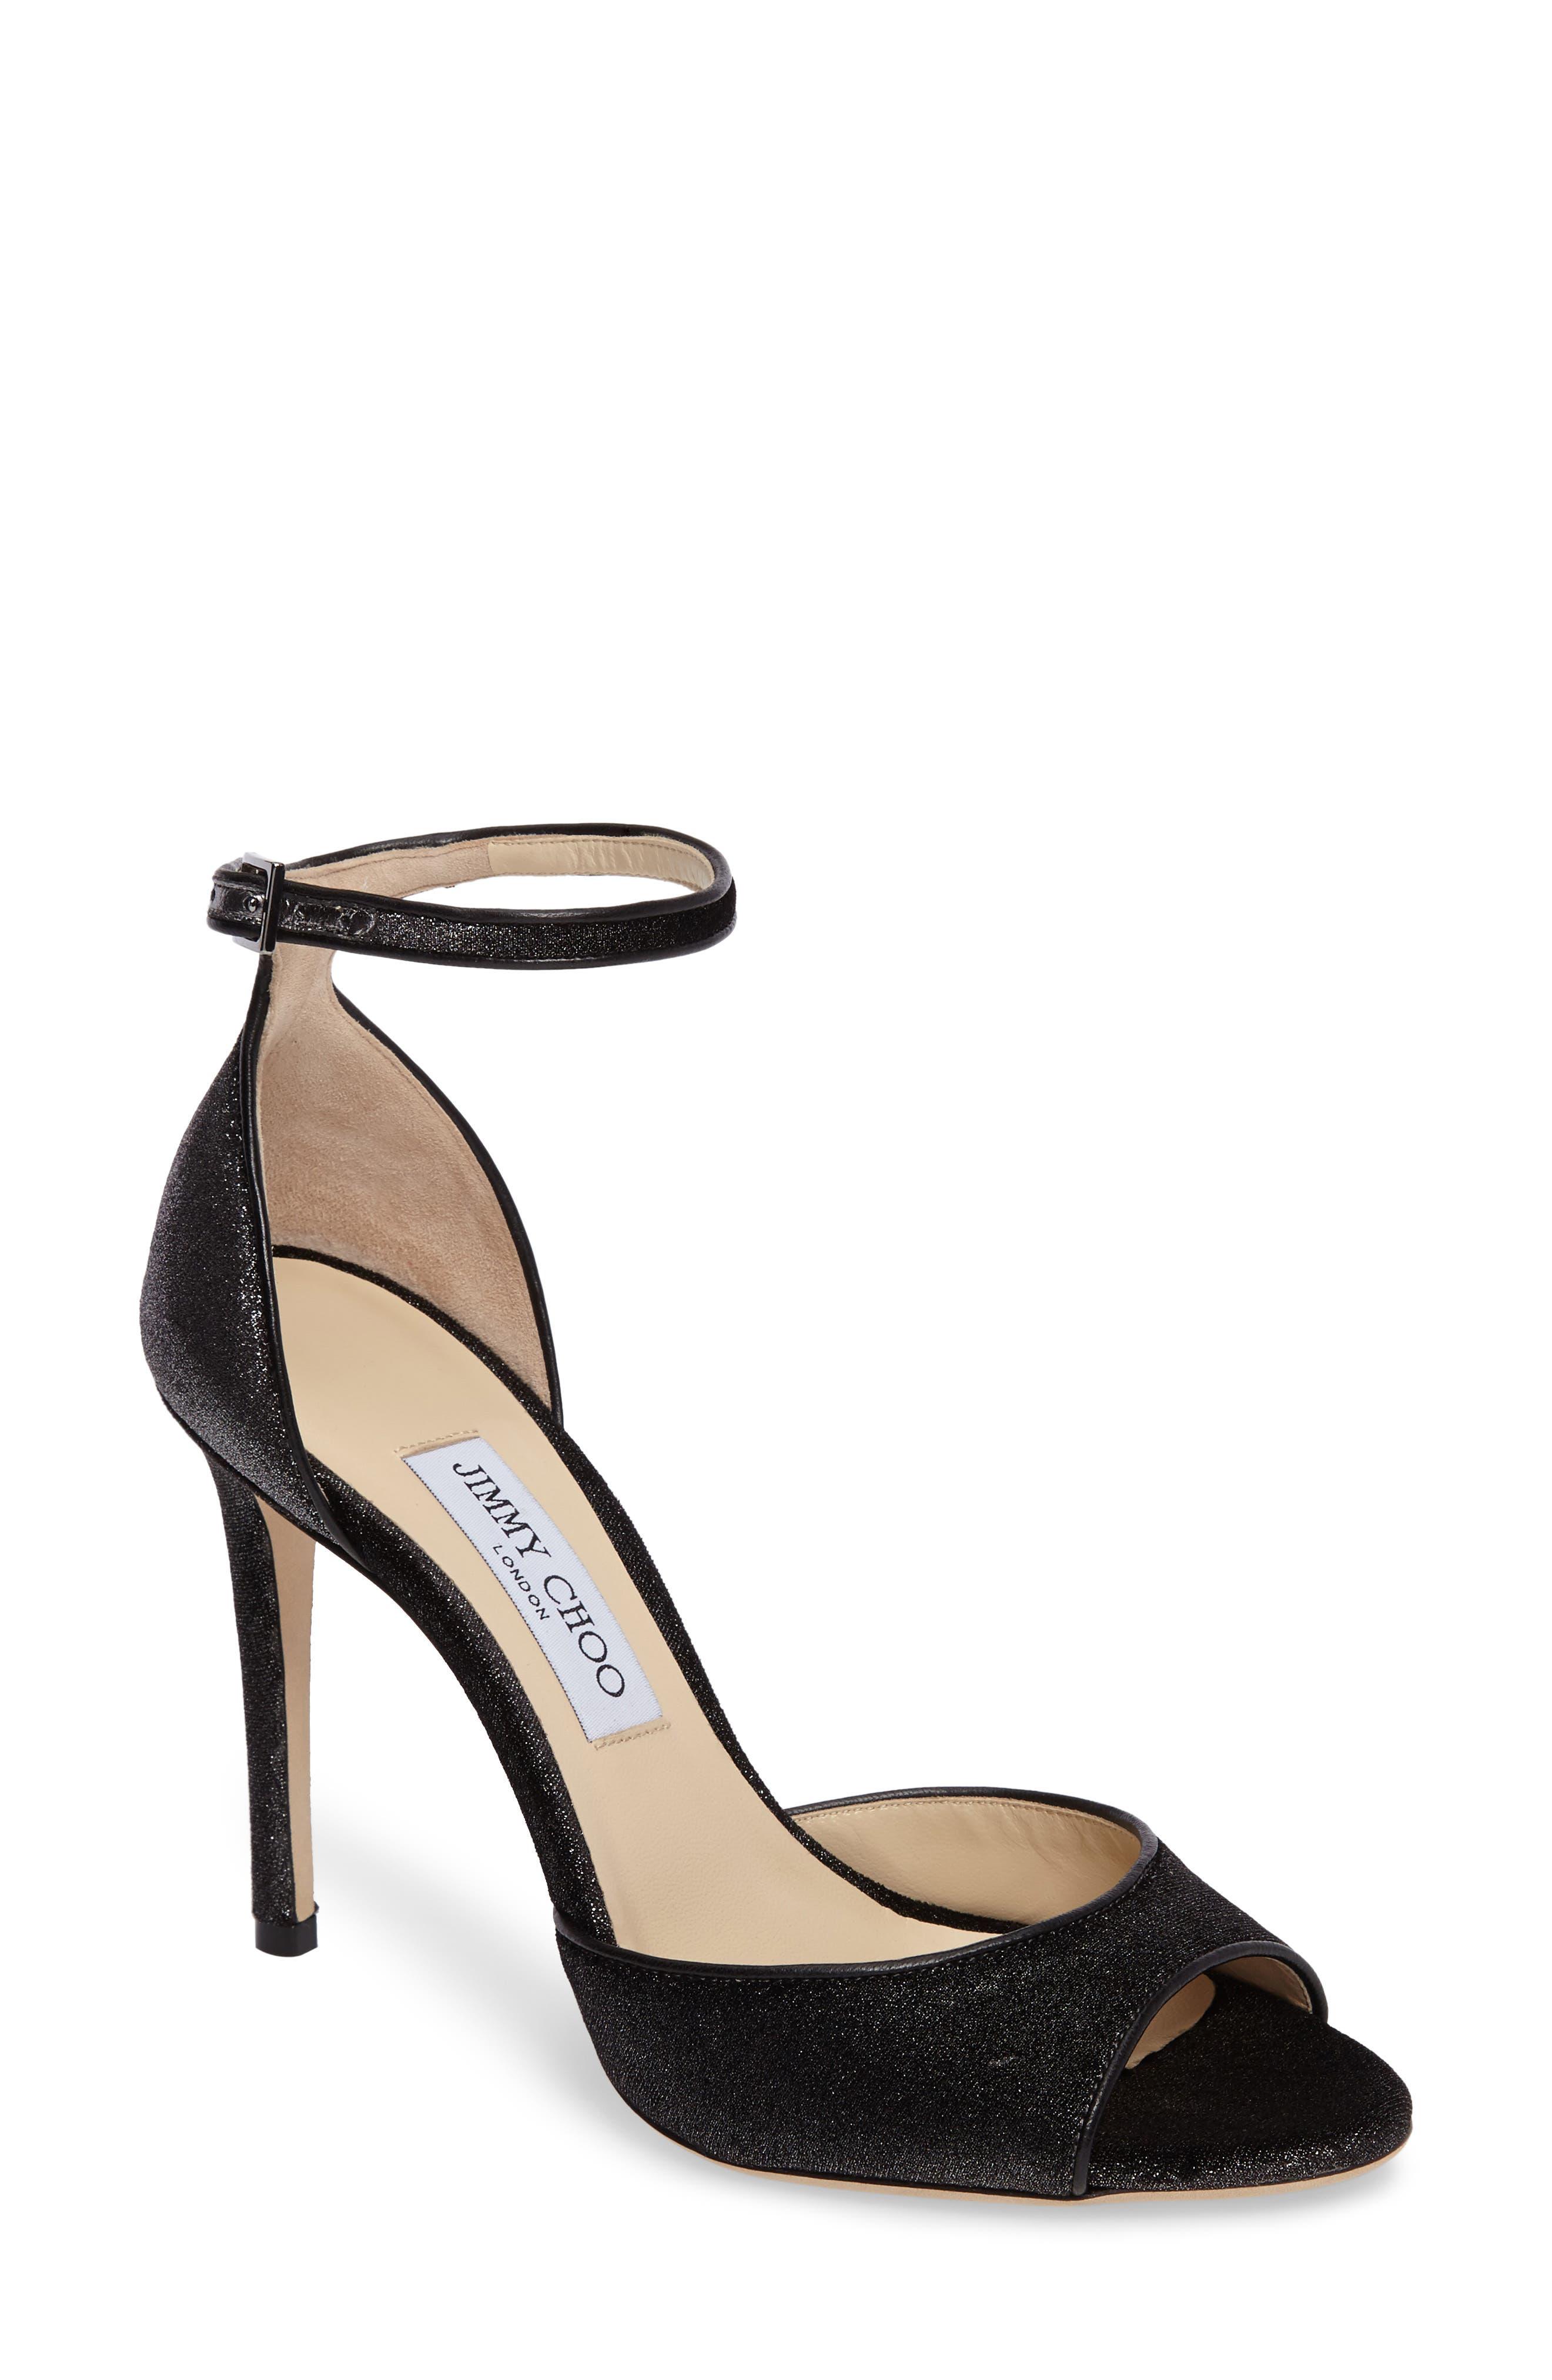 Main Image - Jimmy Choo Annie Ankle Strap Sandal (Women)